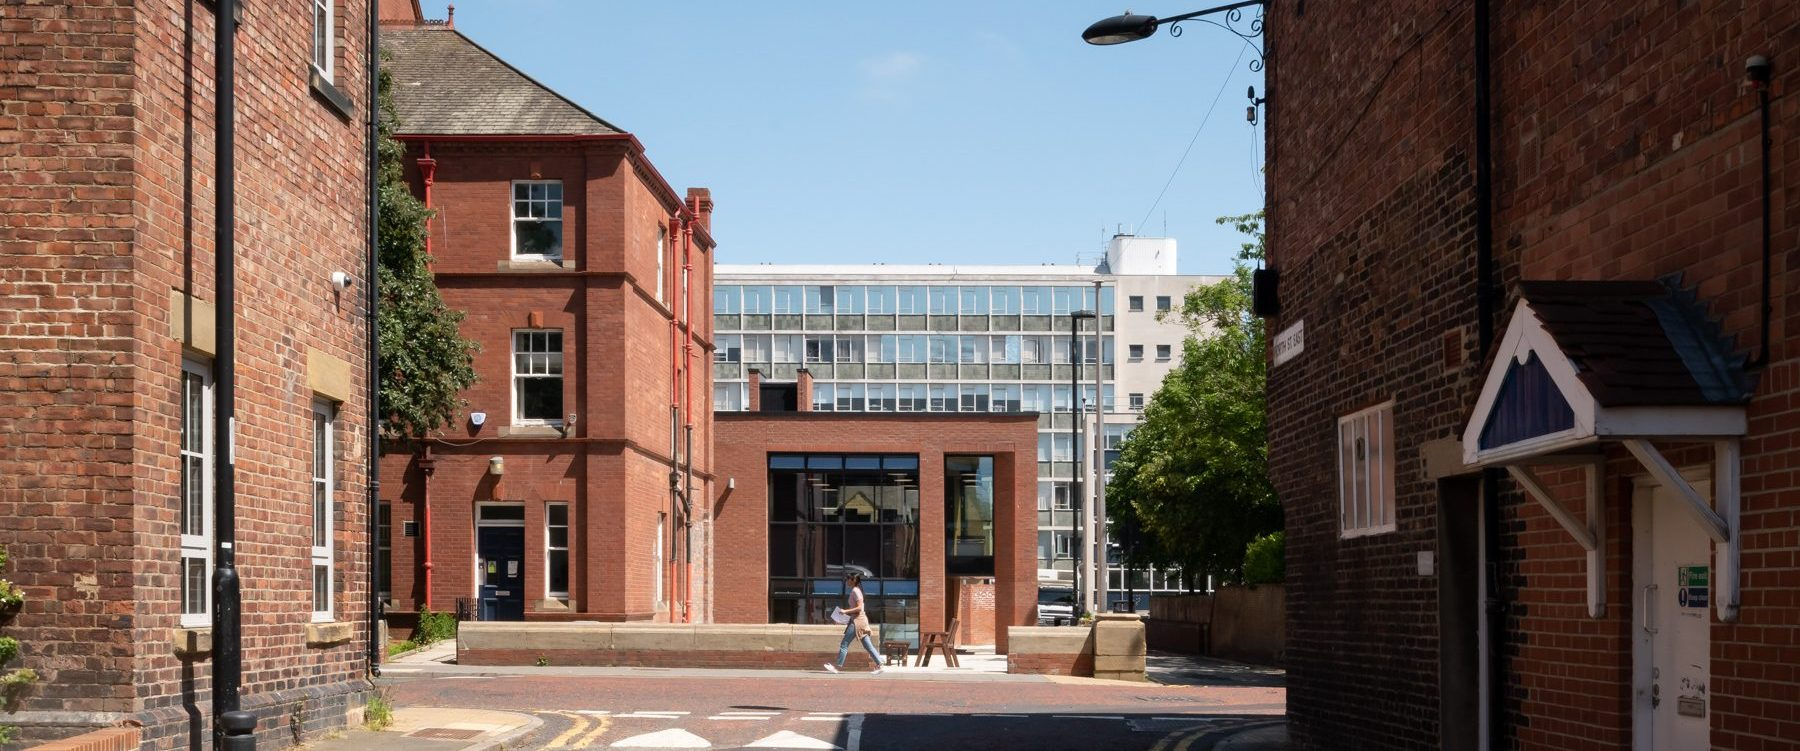 Northumbria University Architecture Building